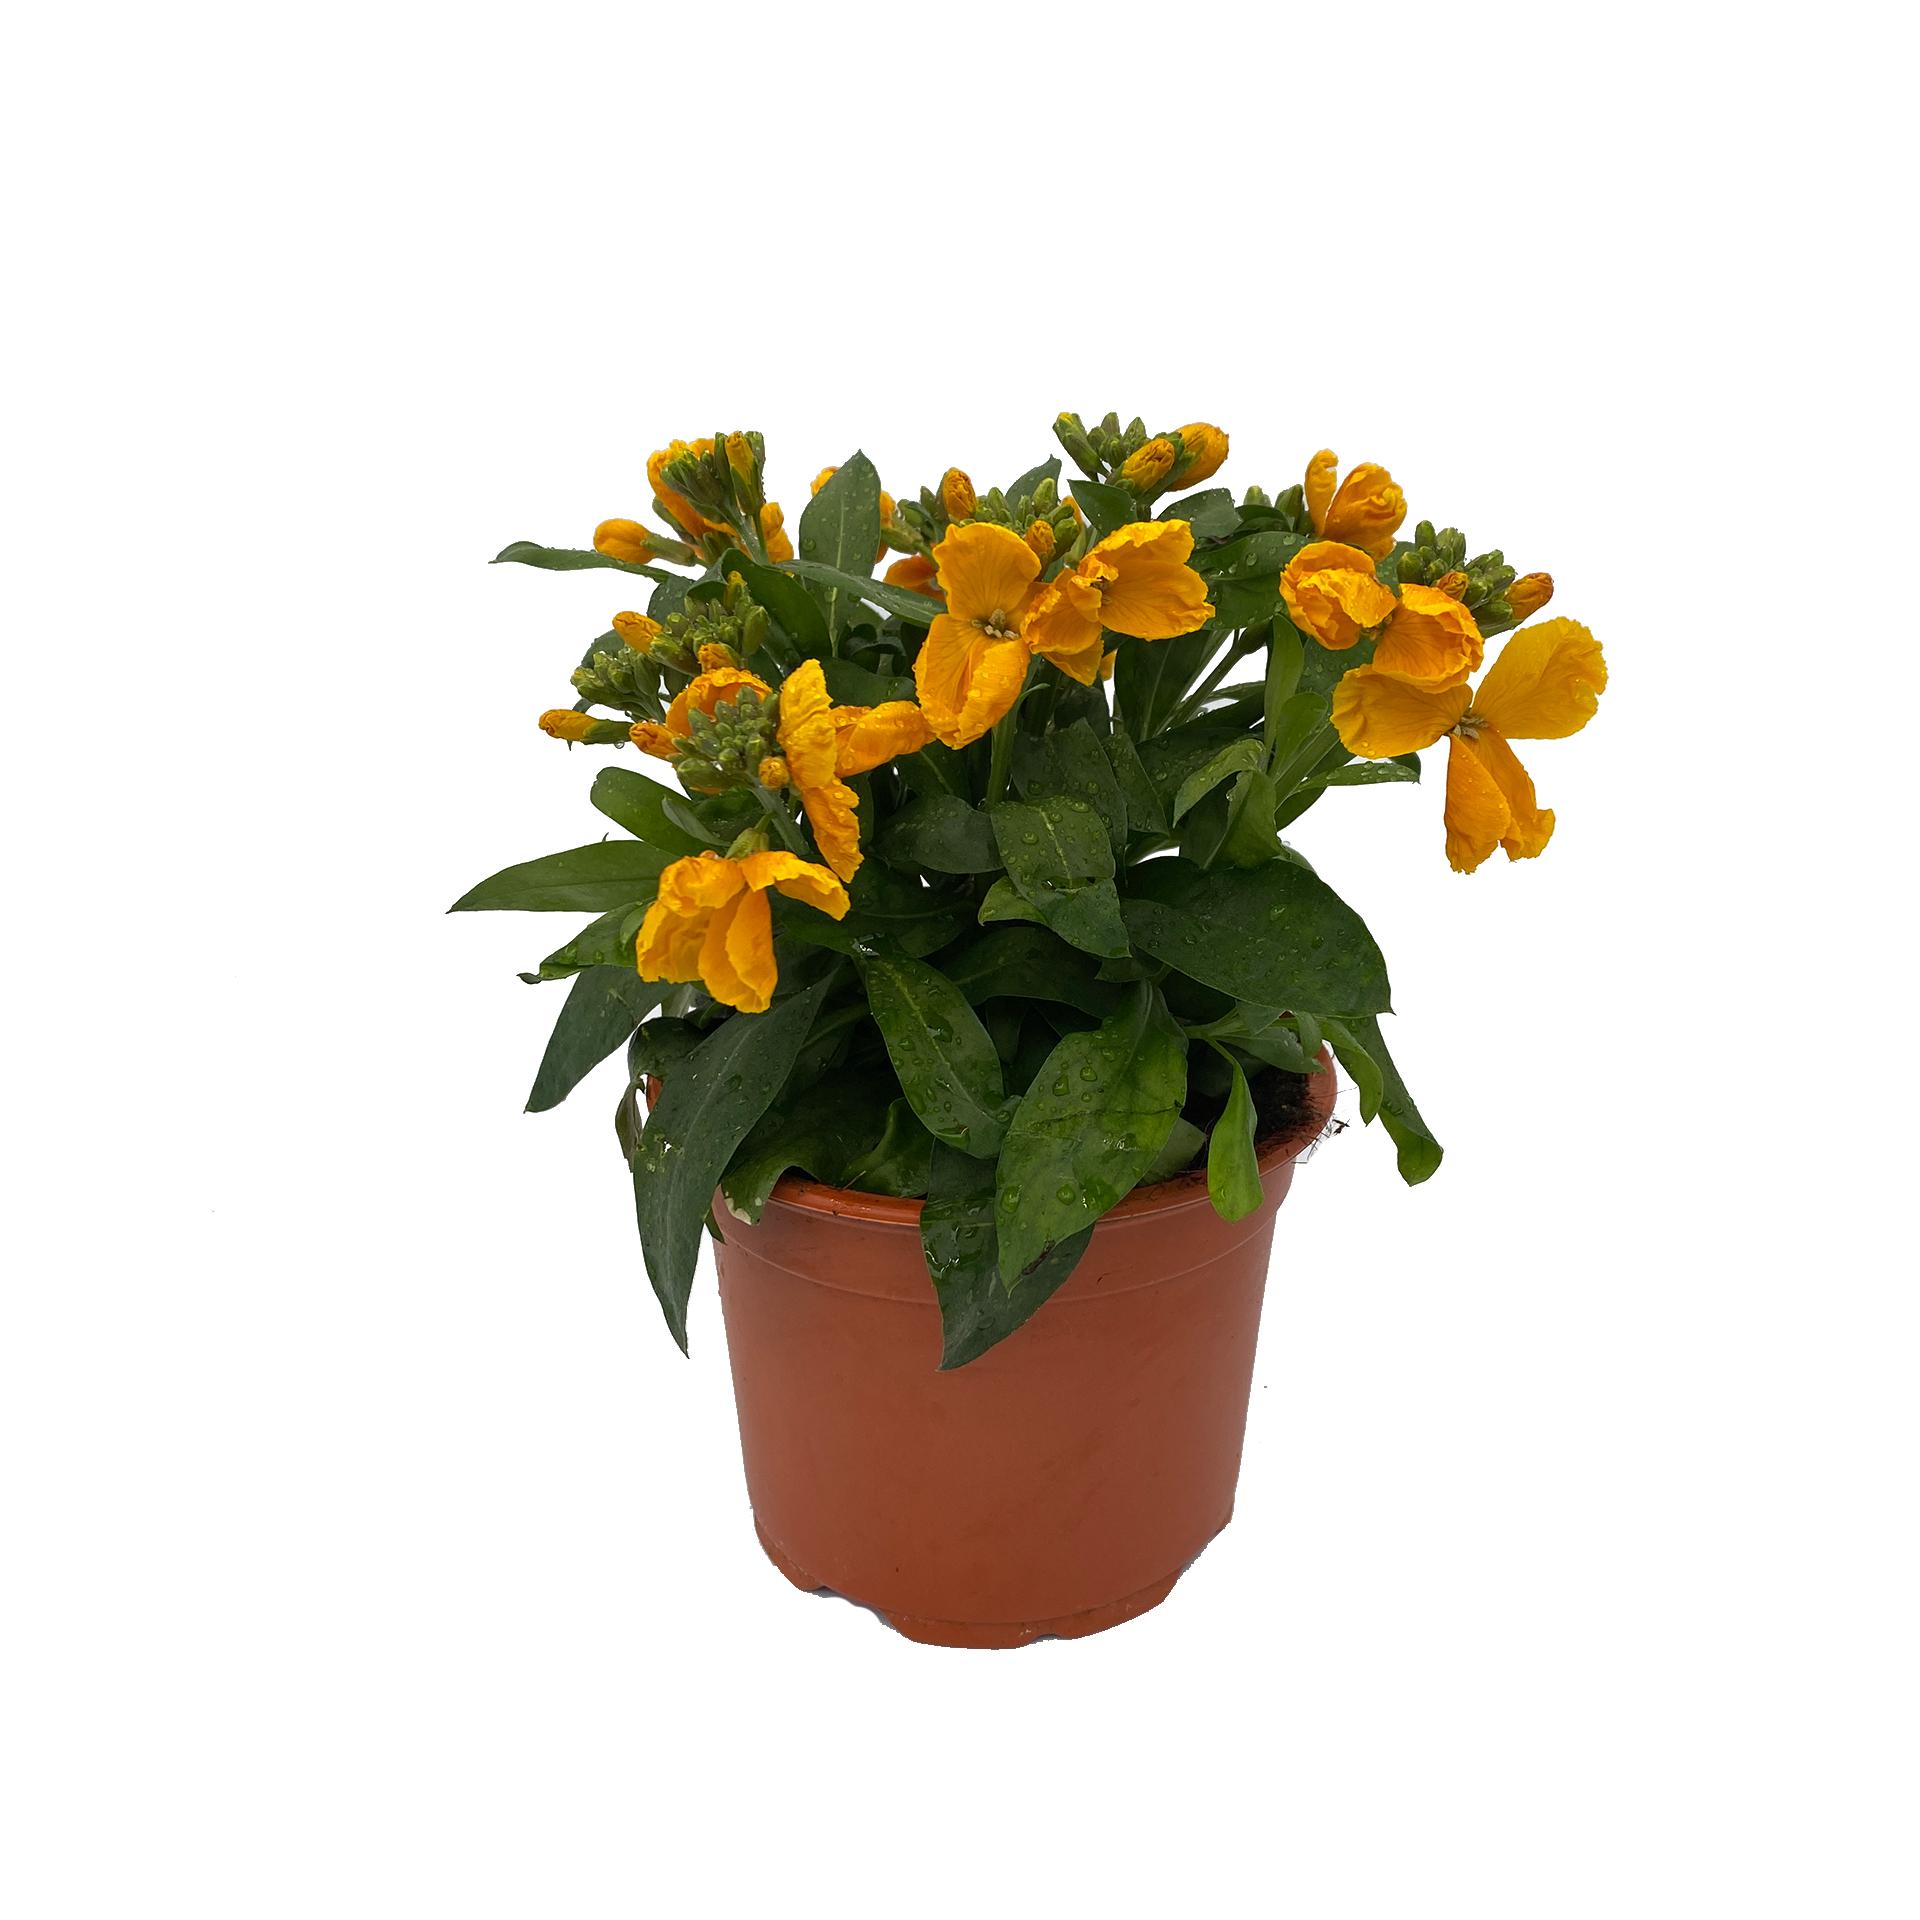 Goldlack - Erysimum cheiri gelb, 13cm Topf